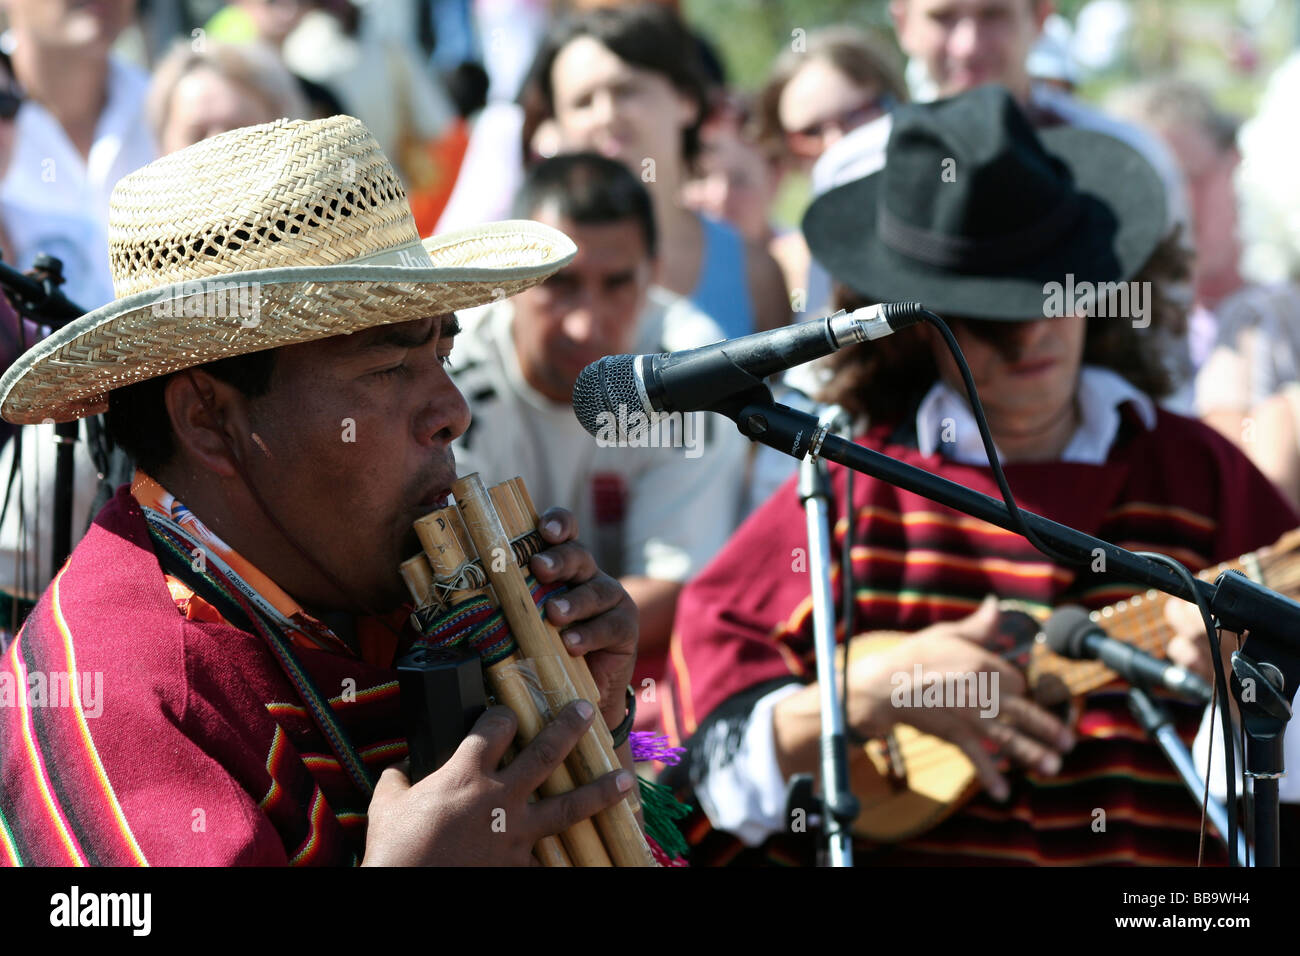 Grupo de los músicos de la calle boliviano flauta Zampona boliviano Charango  guitarra boliviana Imagen De 3b5af269d5e